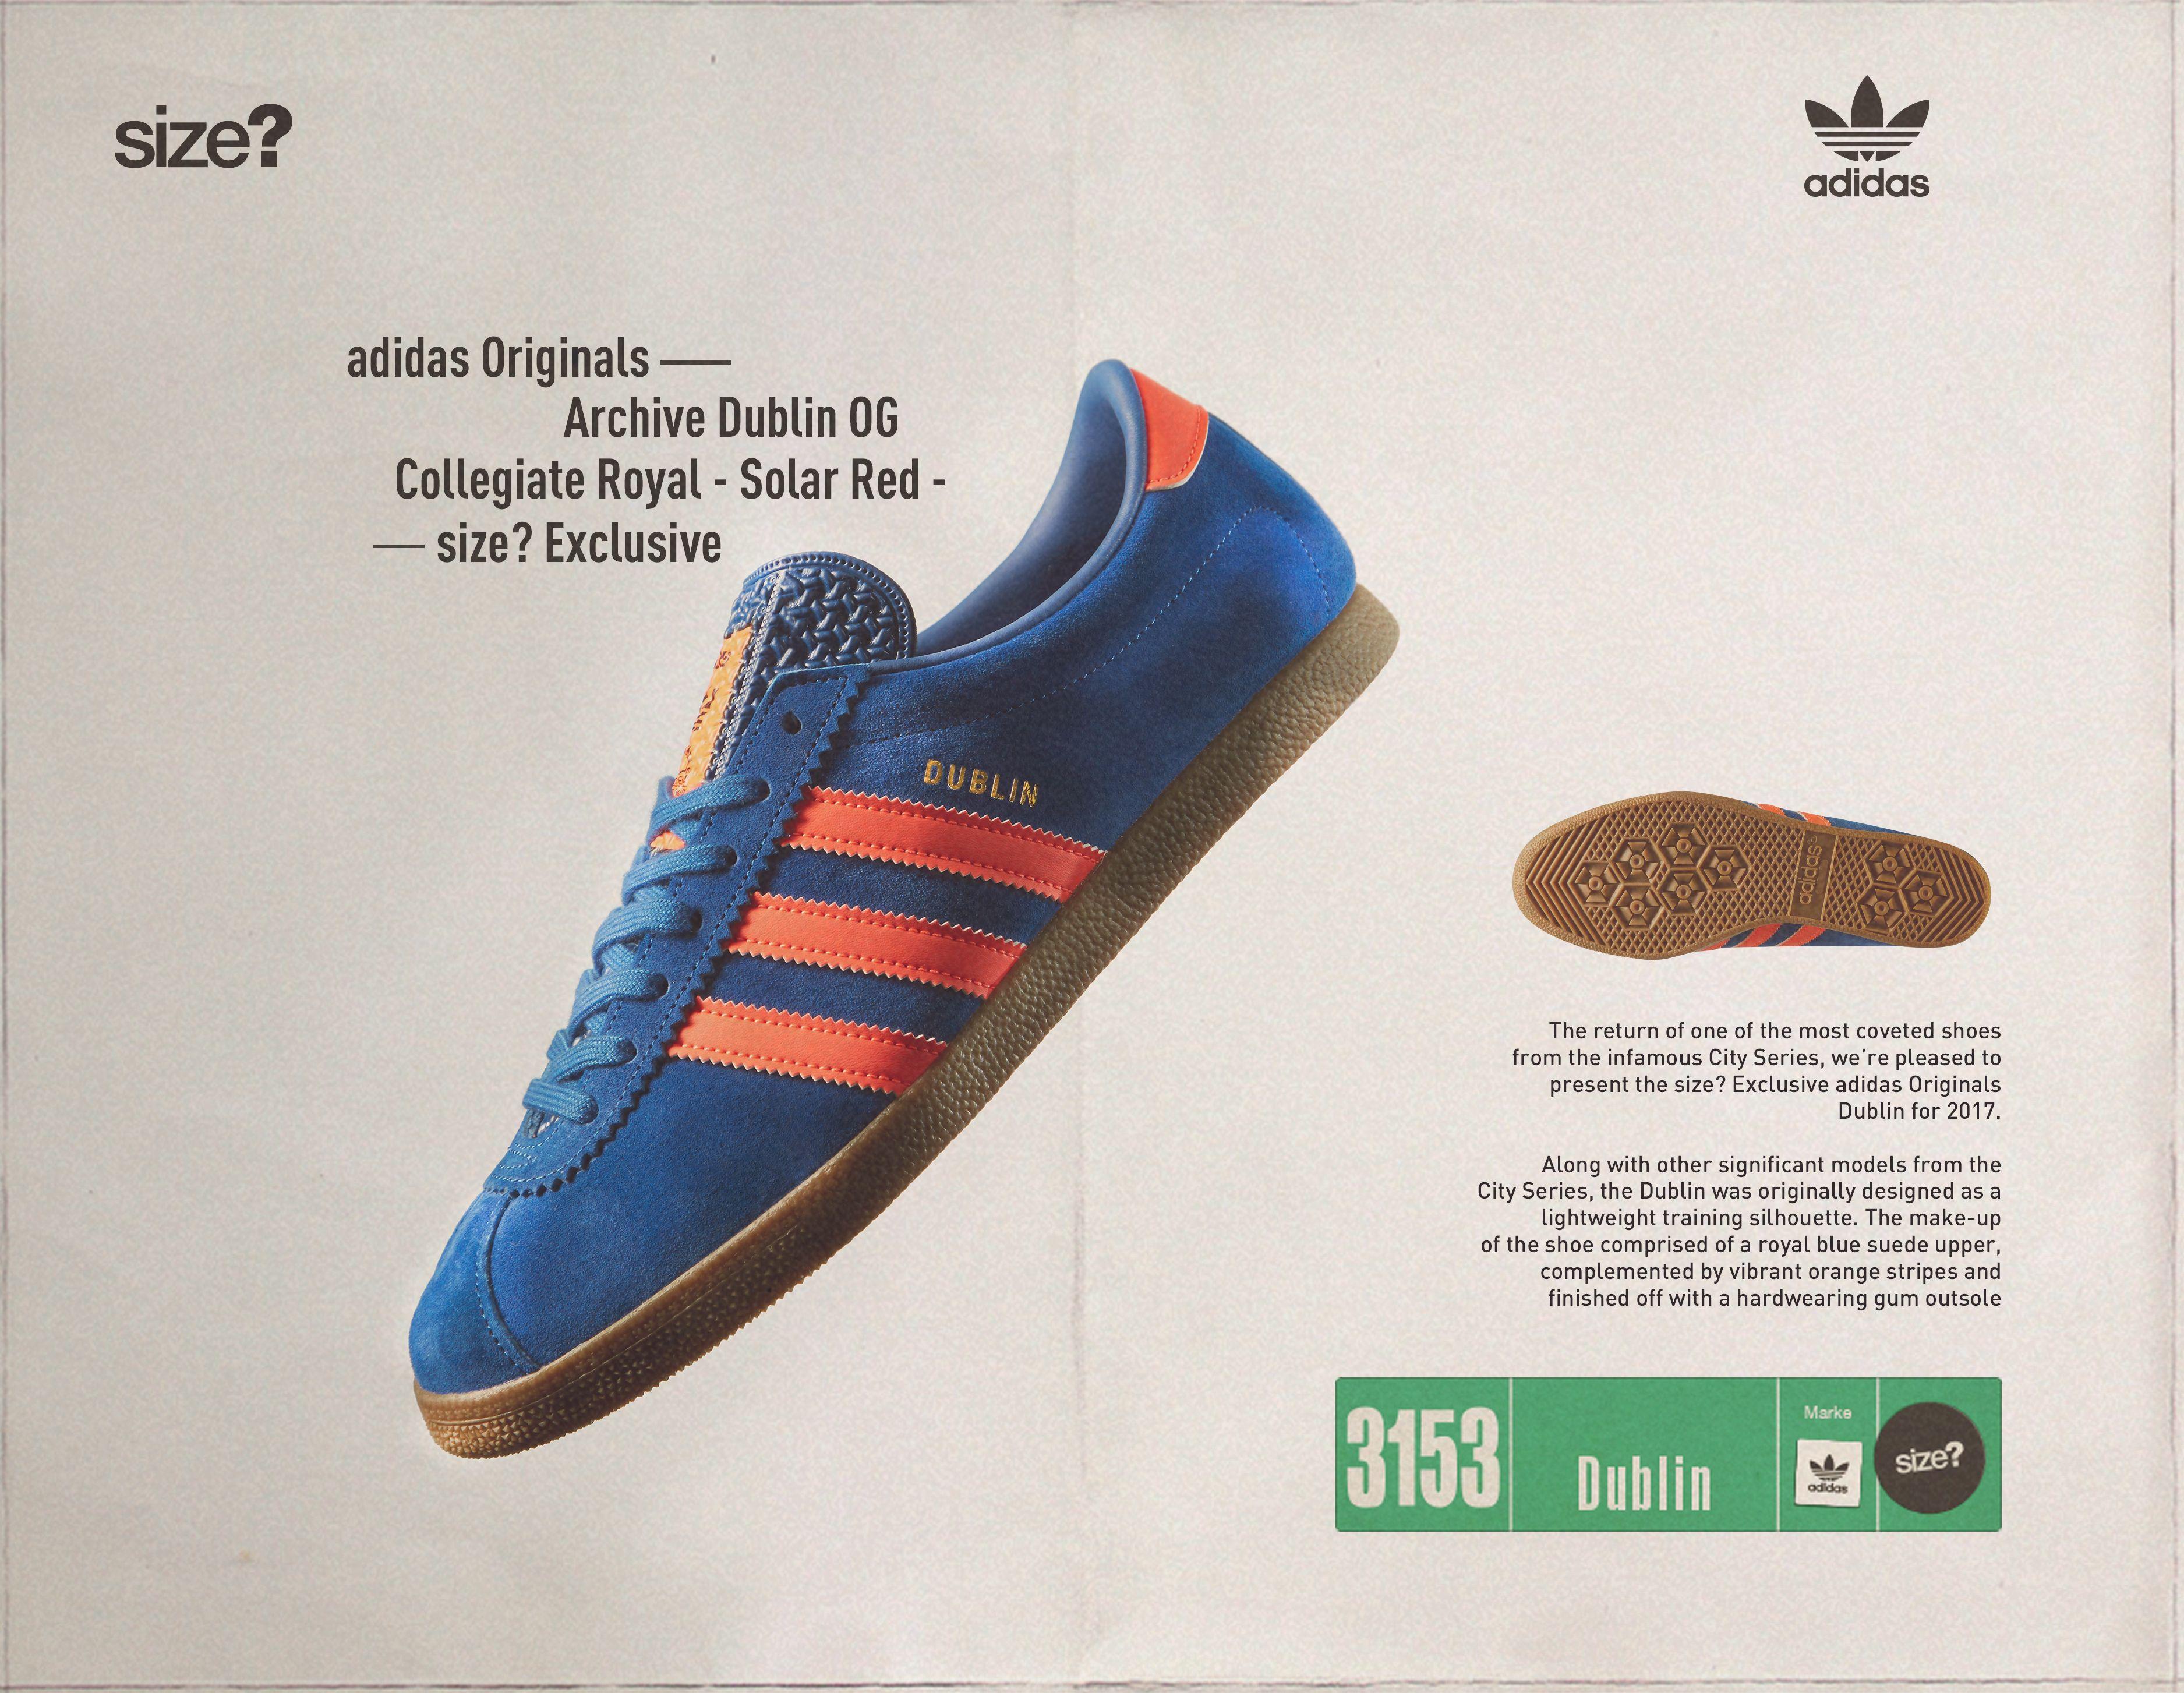 adidas Originals Archive Dublin - size? Exclusive | Adidas